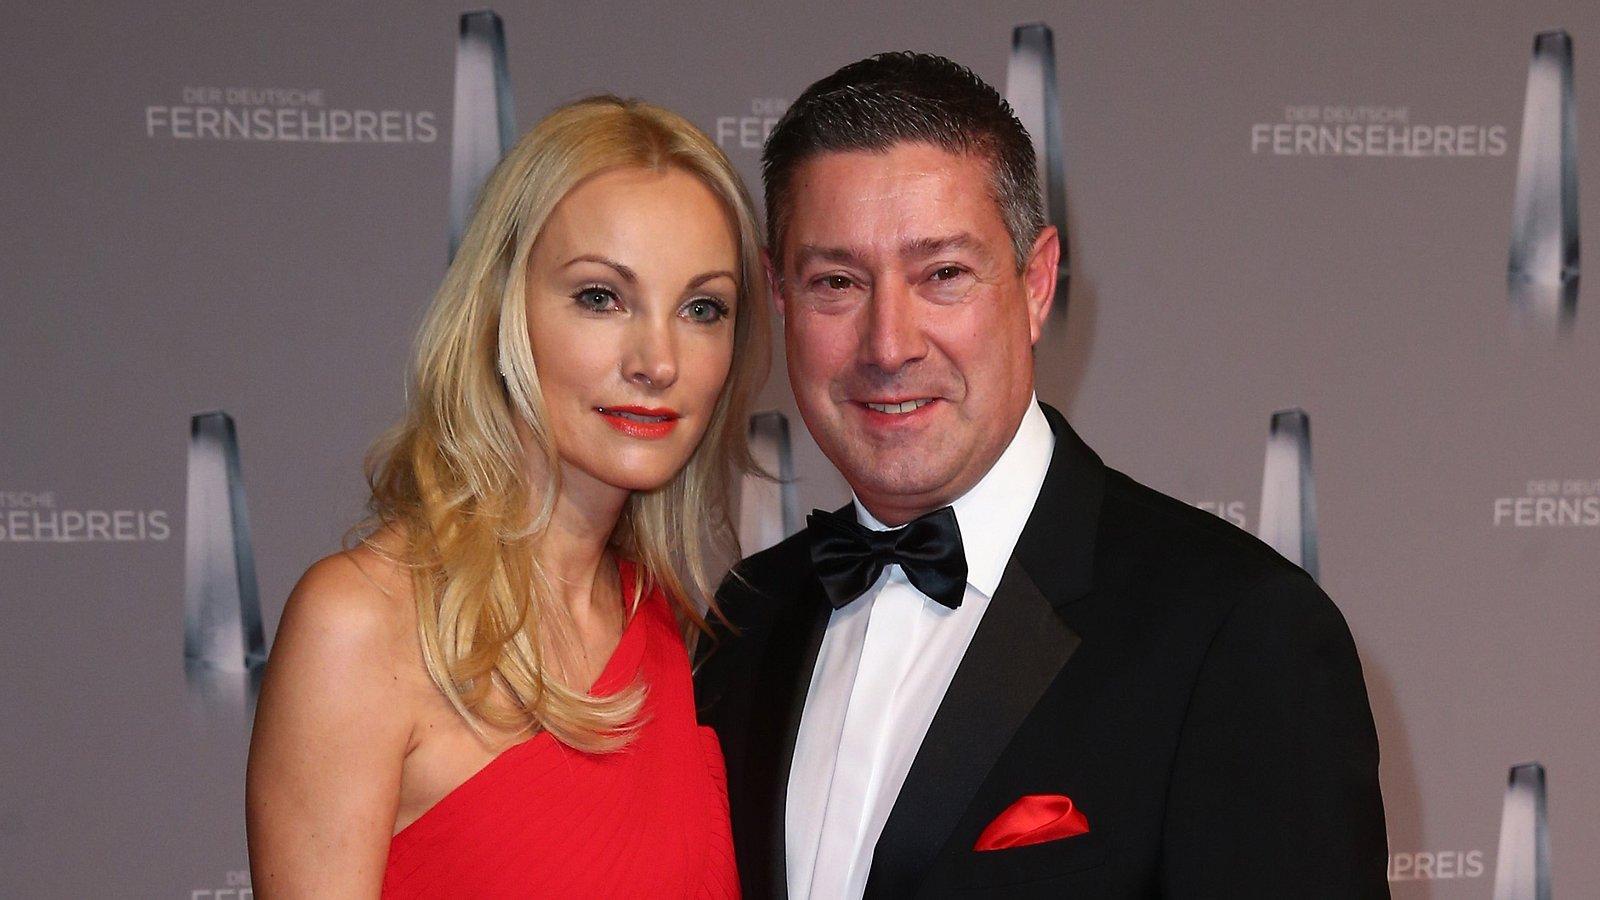 Joachim Llambi und Frau Ilona: Liebes-Comeback offenbar